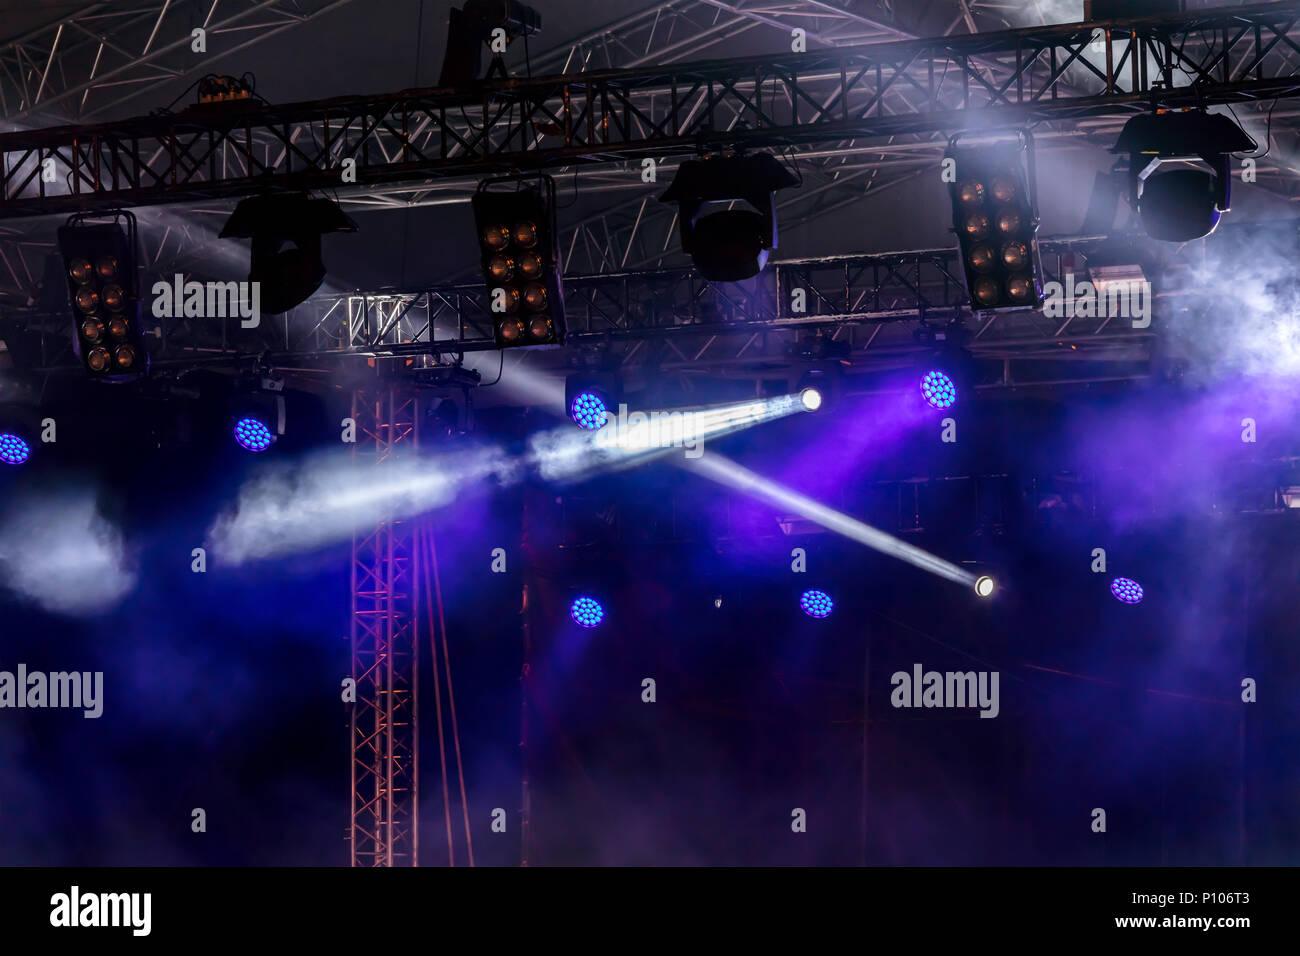 0c96c5988 Etapa lightning equipo. Un rayo azul de proyectores, rayos reflector ...